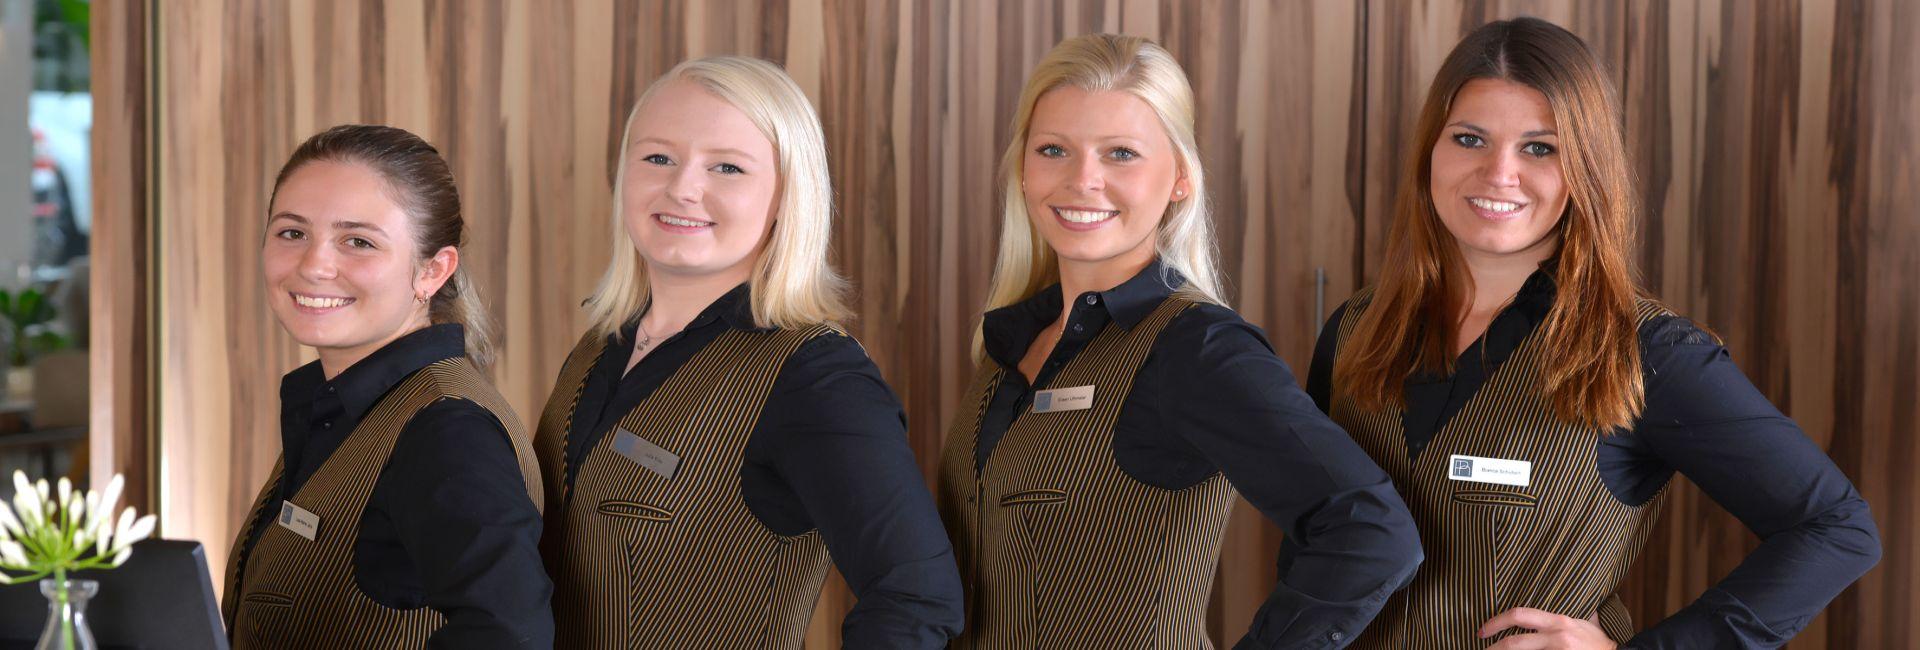 Rezeptions Team Parkhotel Oberhausen